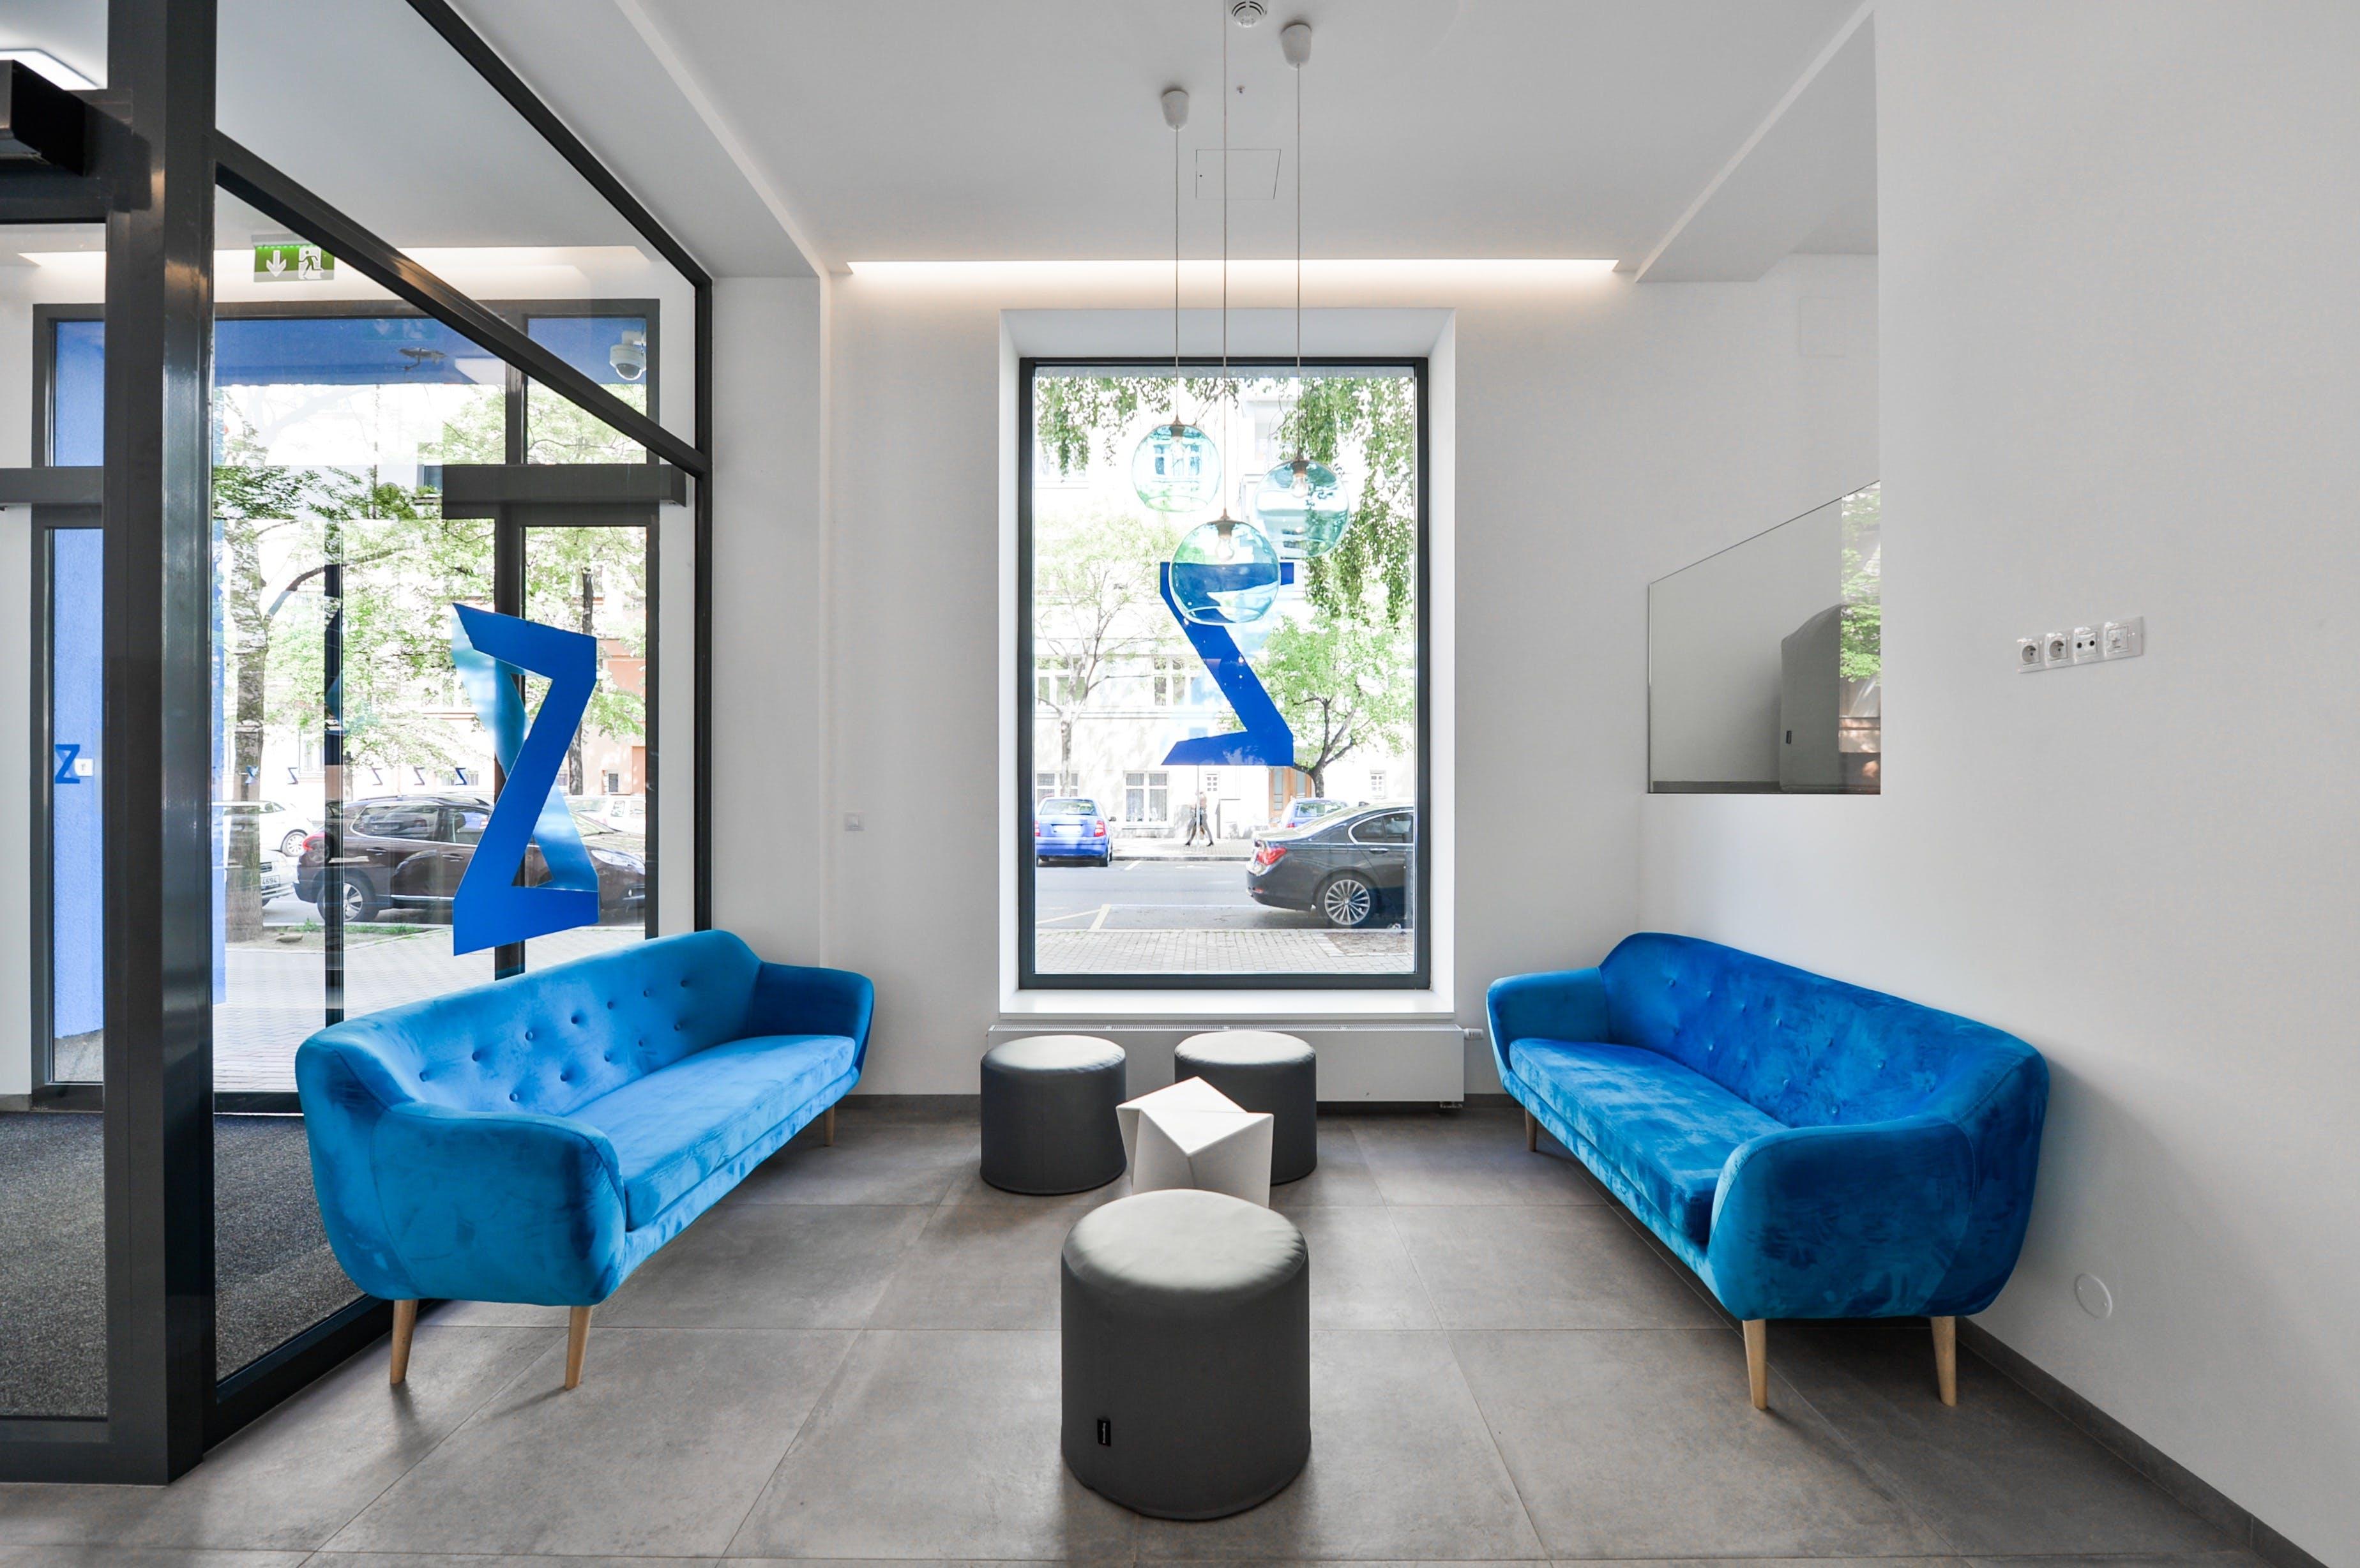 237 Residents   Holešovice   Trendy Urban Building w/ Coworking